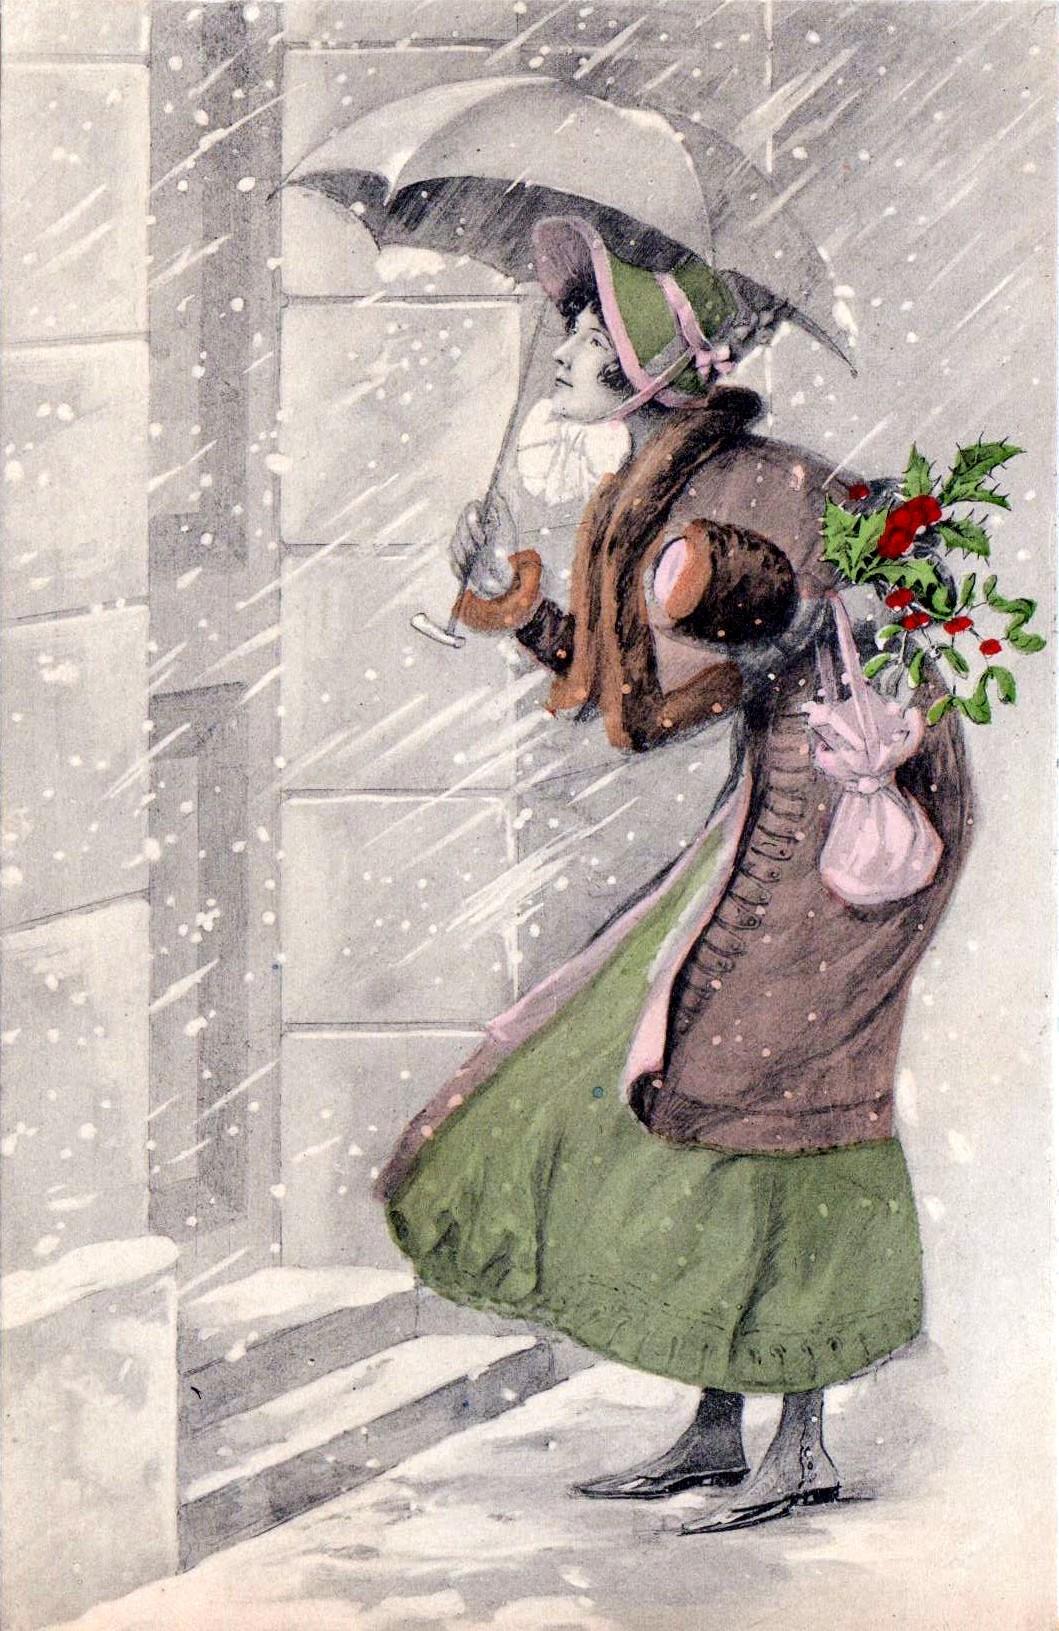 FileThe Christmas Visit Postcard C 1910jpg Wikipedia